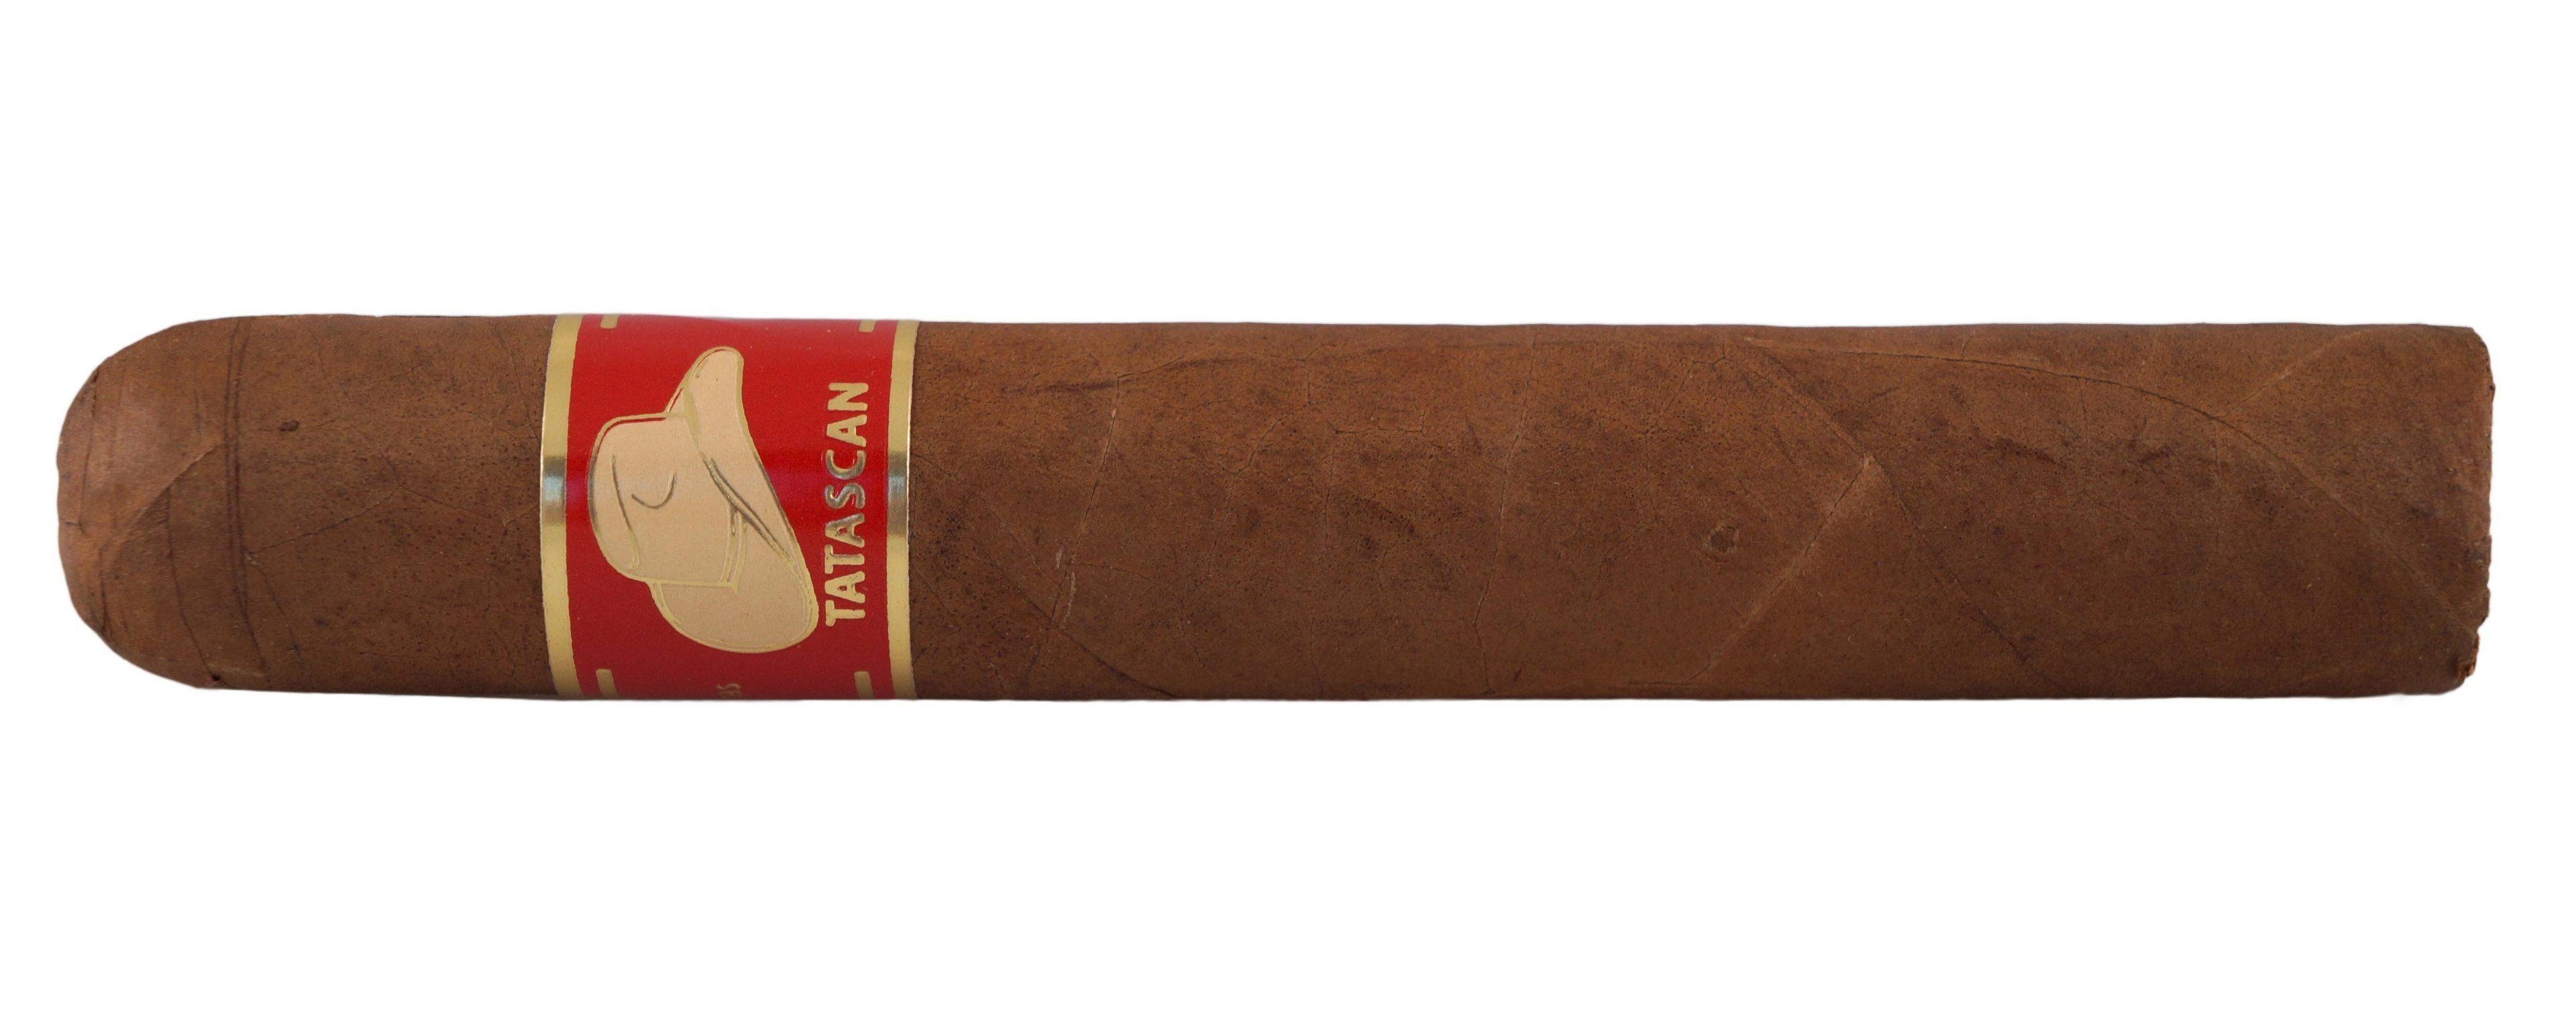 Blind Cigar Review: Tatascan | Robusto